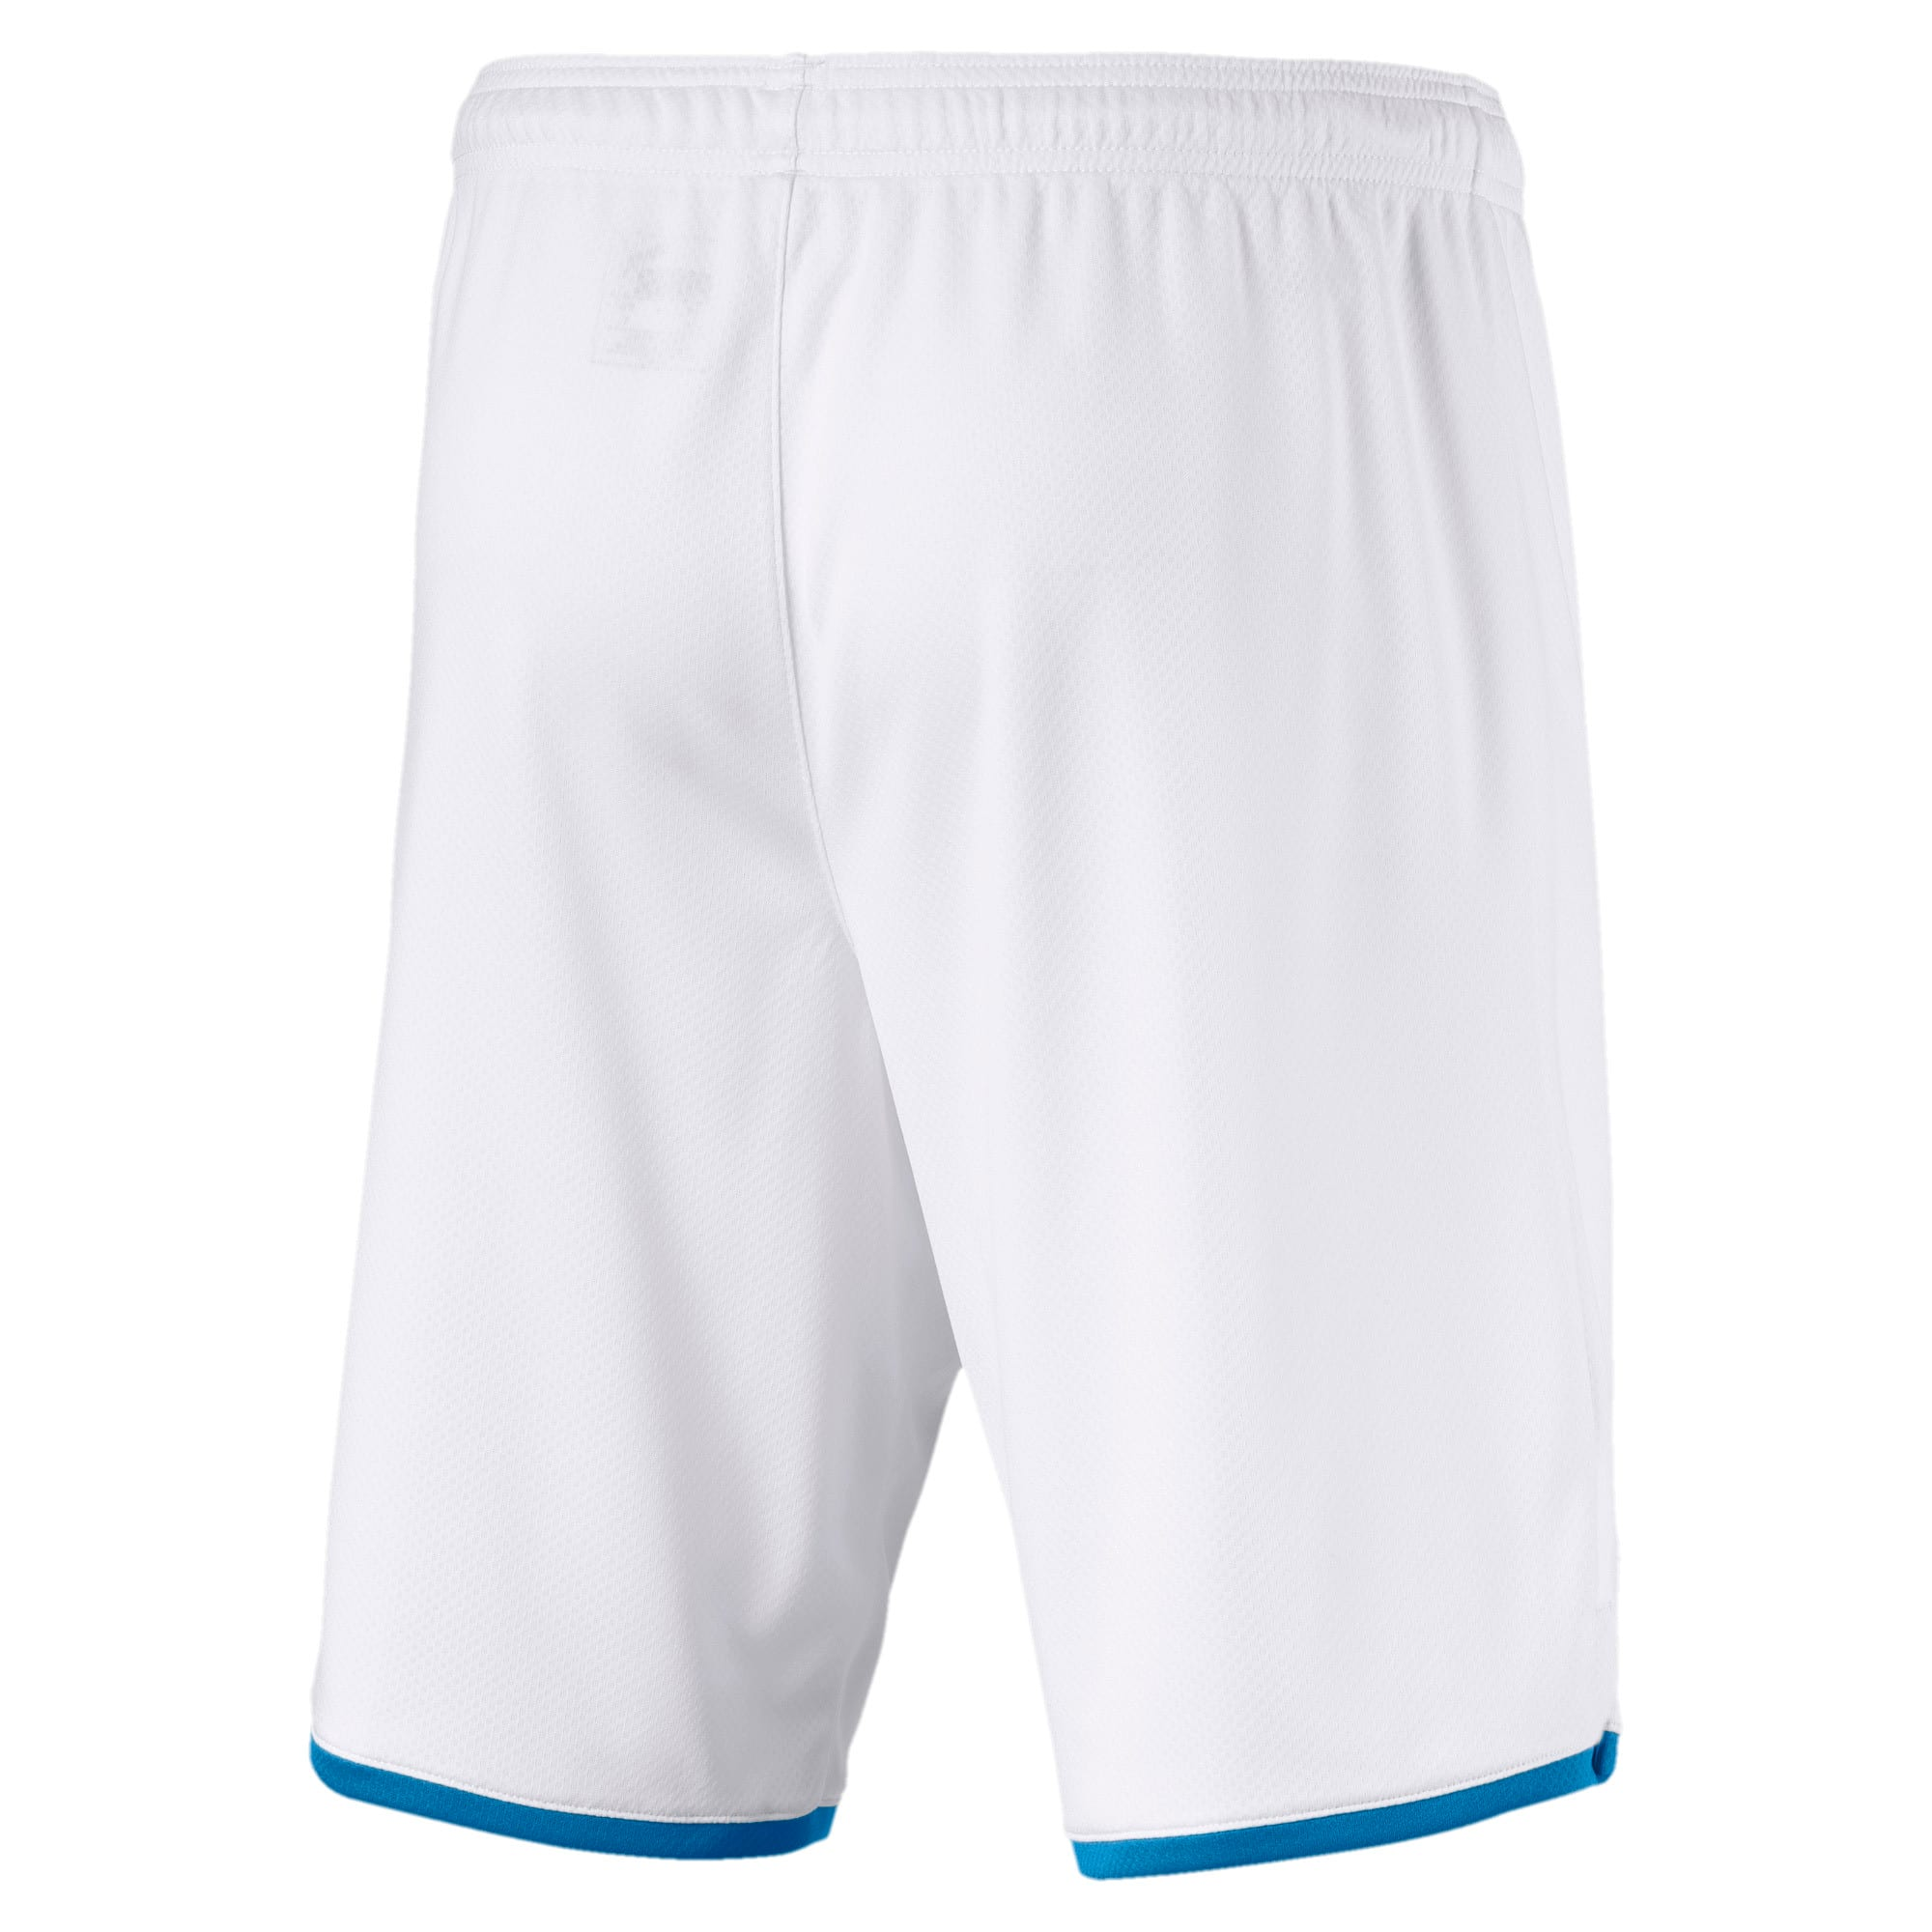 Thumbnail 2 of Olympique de Marseille Men's Replica Shorts, Puma White-Bleu Azur, medium